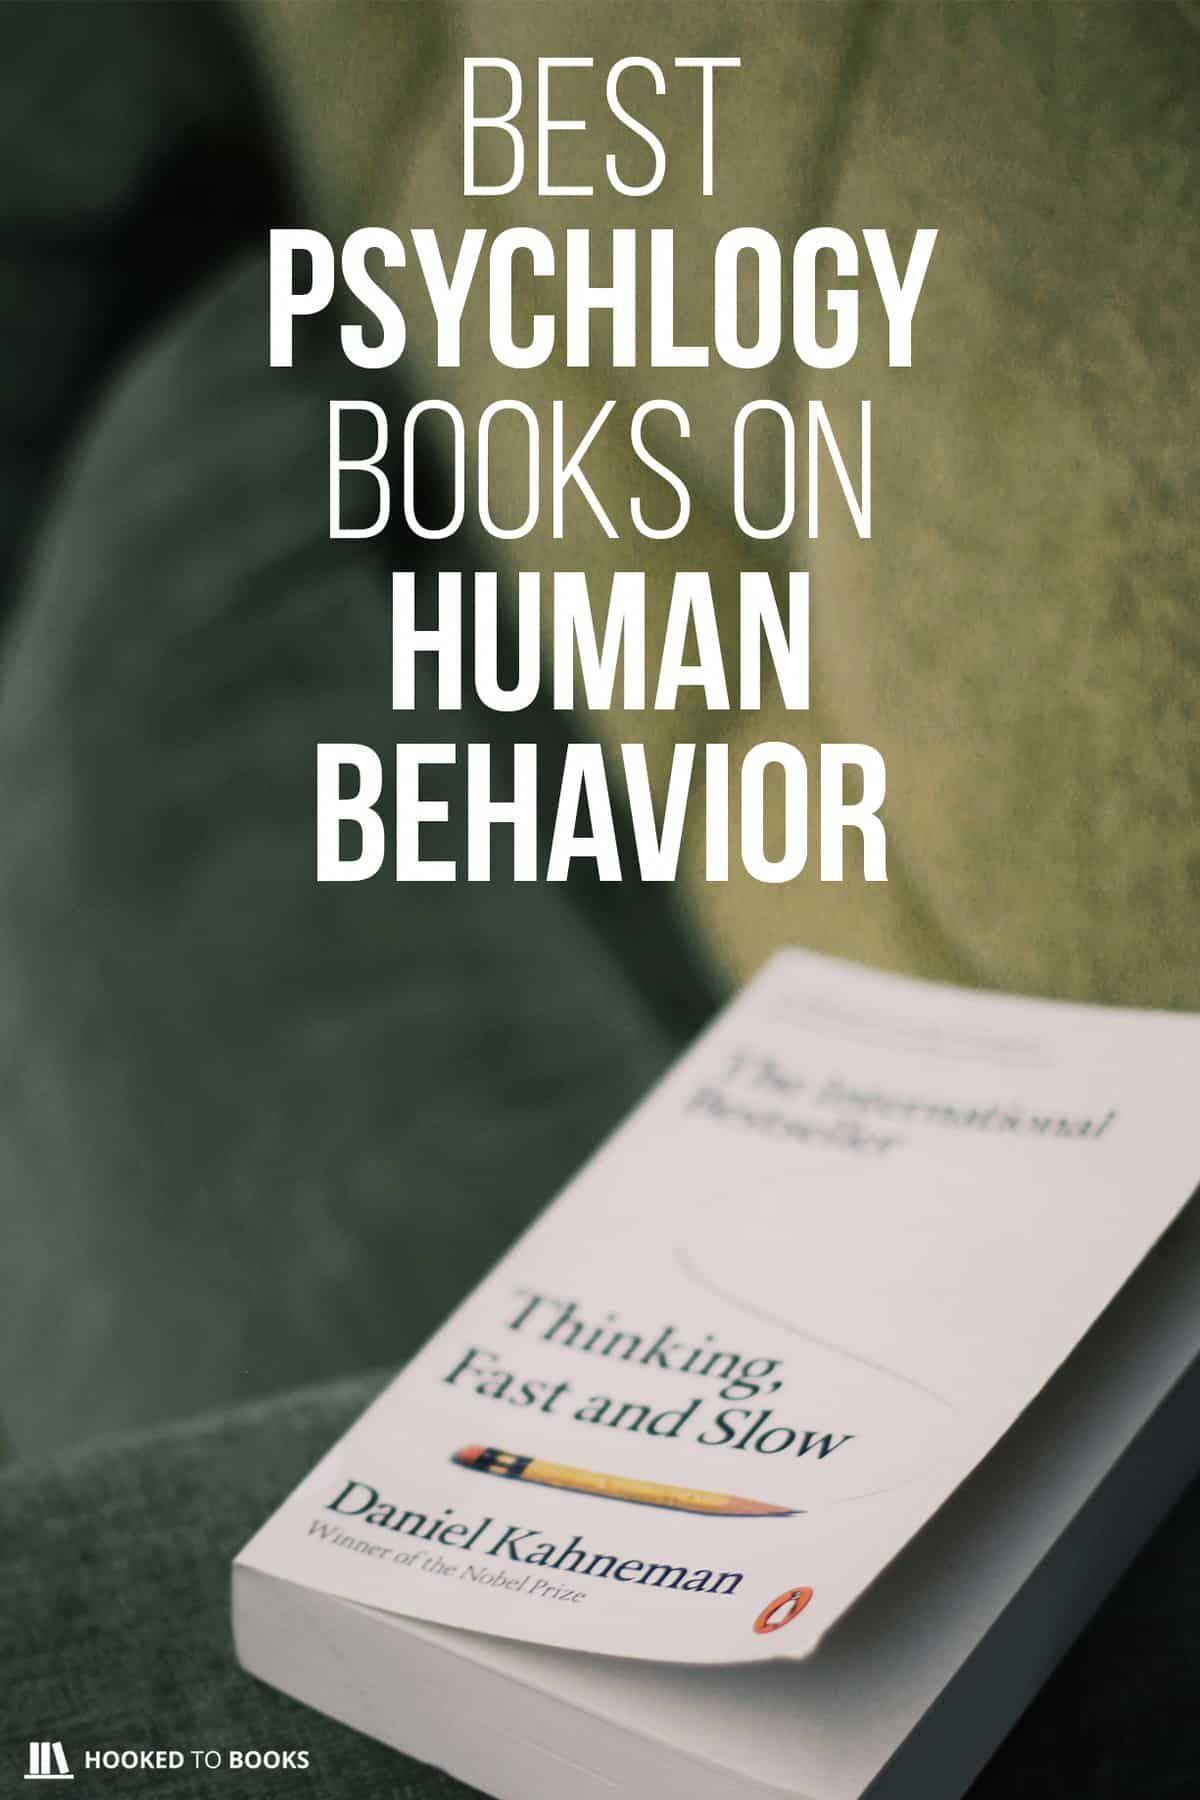 Best Psychology Books On Human Behavior Hooked To Books In 2020 Psychology Books Human Behavior Psychology Books